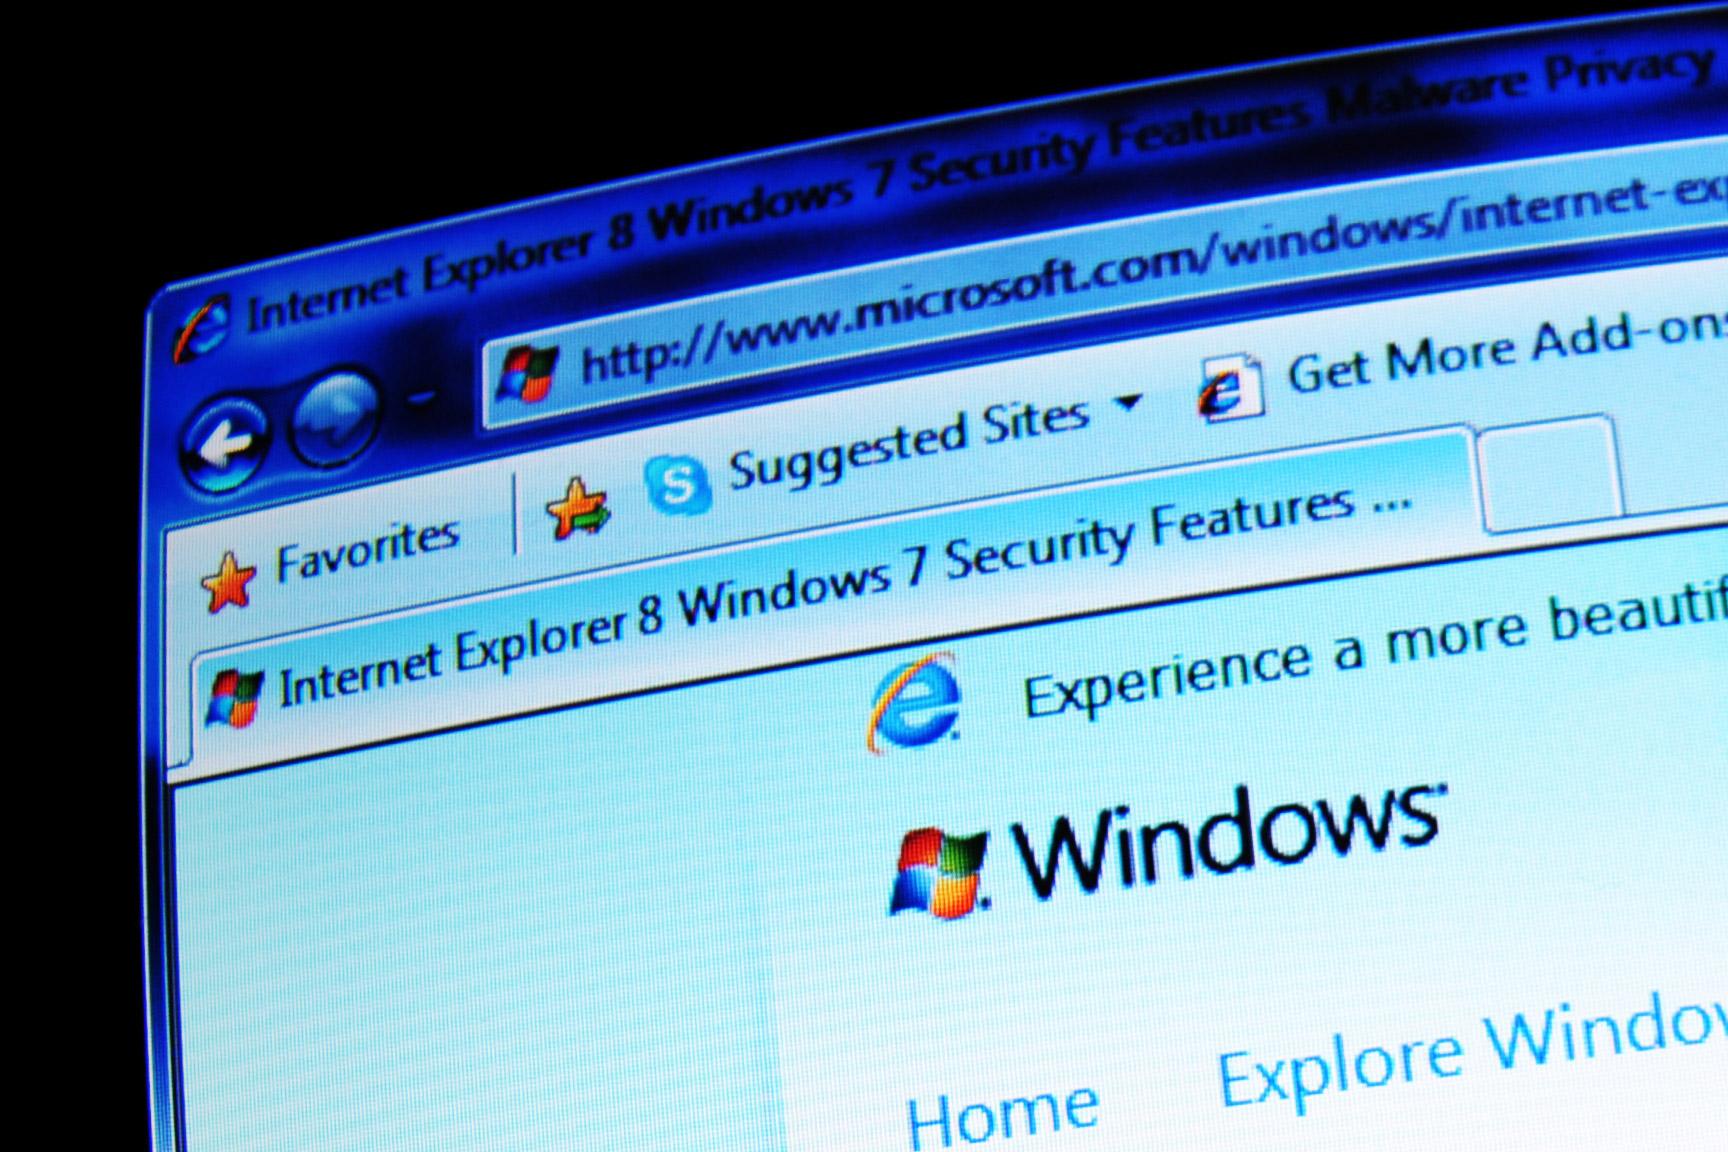 MicrosoftSecurityFlaw.jpg